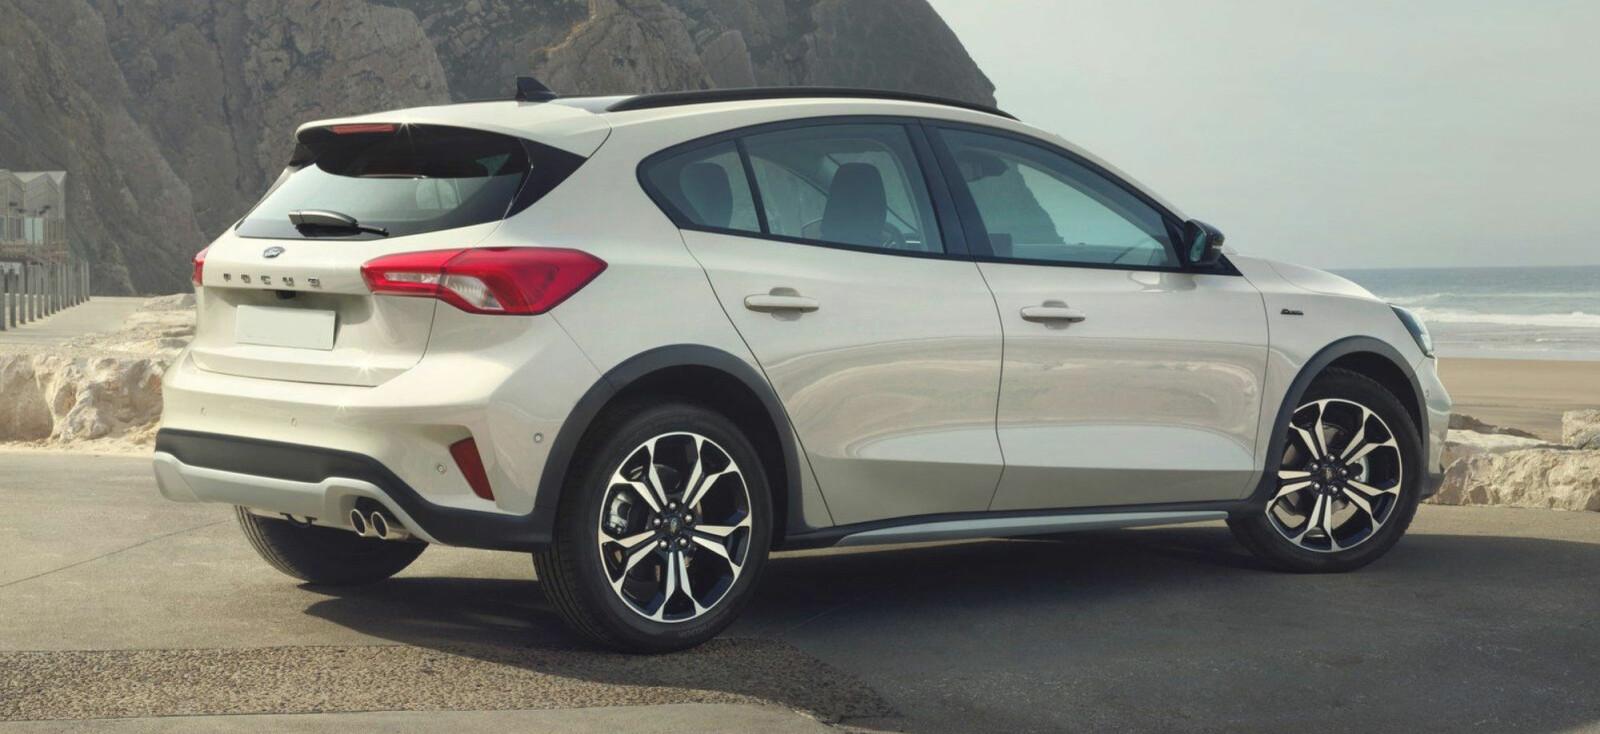 Ny utgave av Ford Focus kommer til Norge rundt årsskiftet. Focus Active starter på under 300.000 kroner.